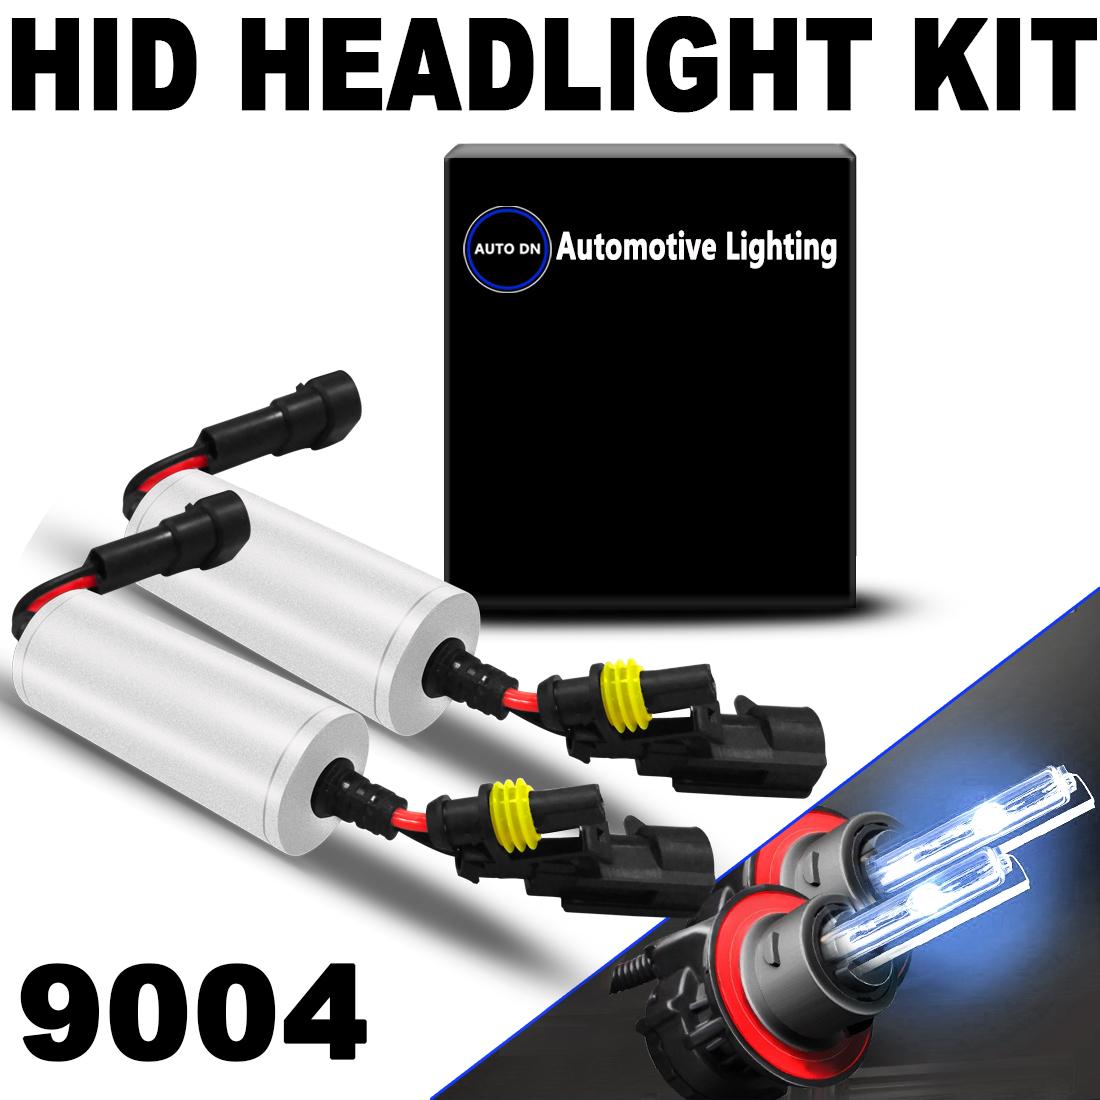 AUTO 2X Bullet Replace Headlight HID Bi-Xenon Light Bulb ...